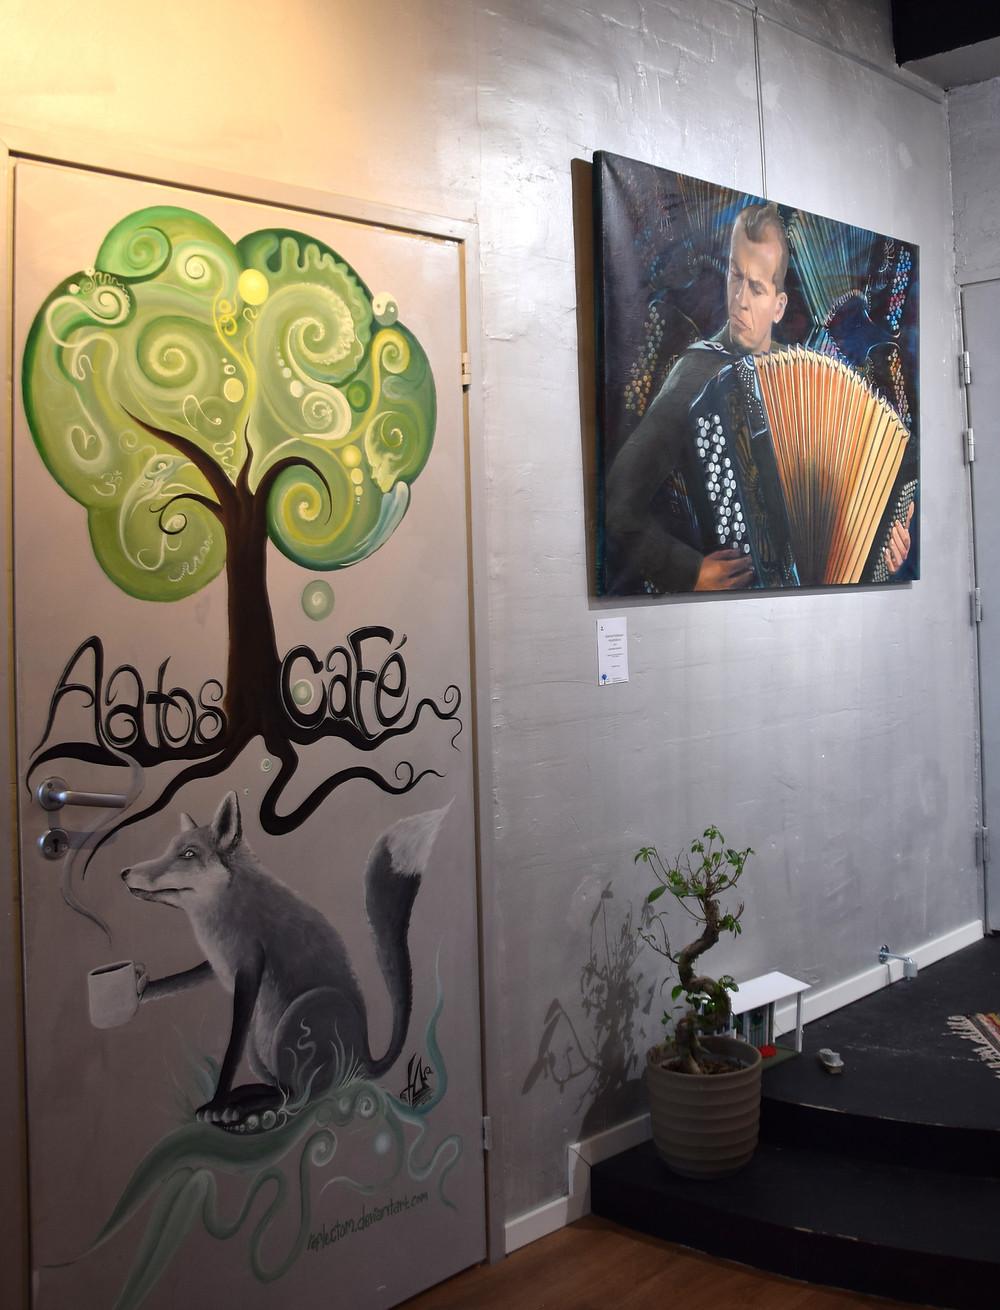 Aatos galleria, Porvoo